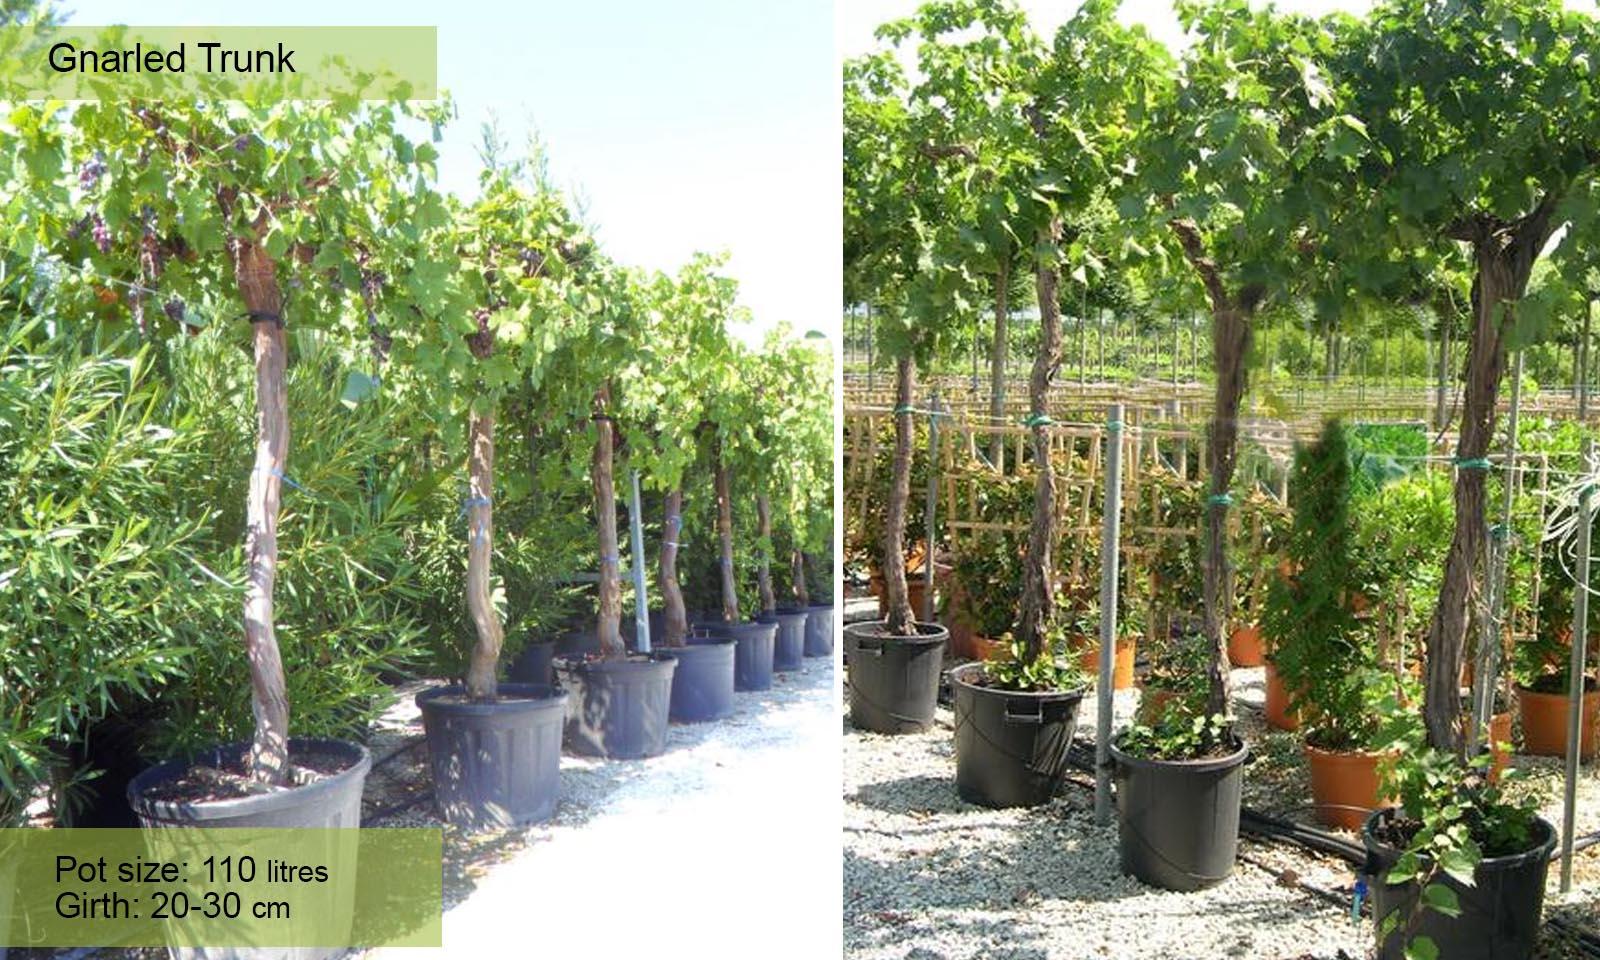 Vitis Vinifera (Grape Tree) - Gnarled Trunk